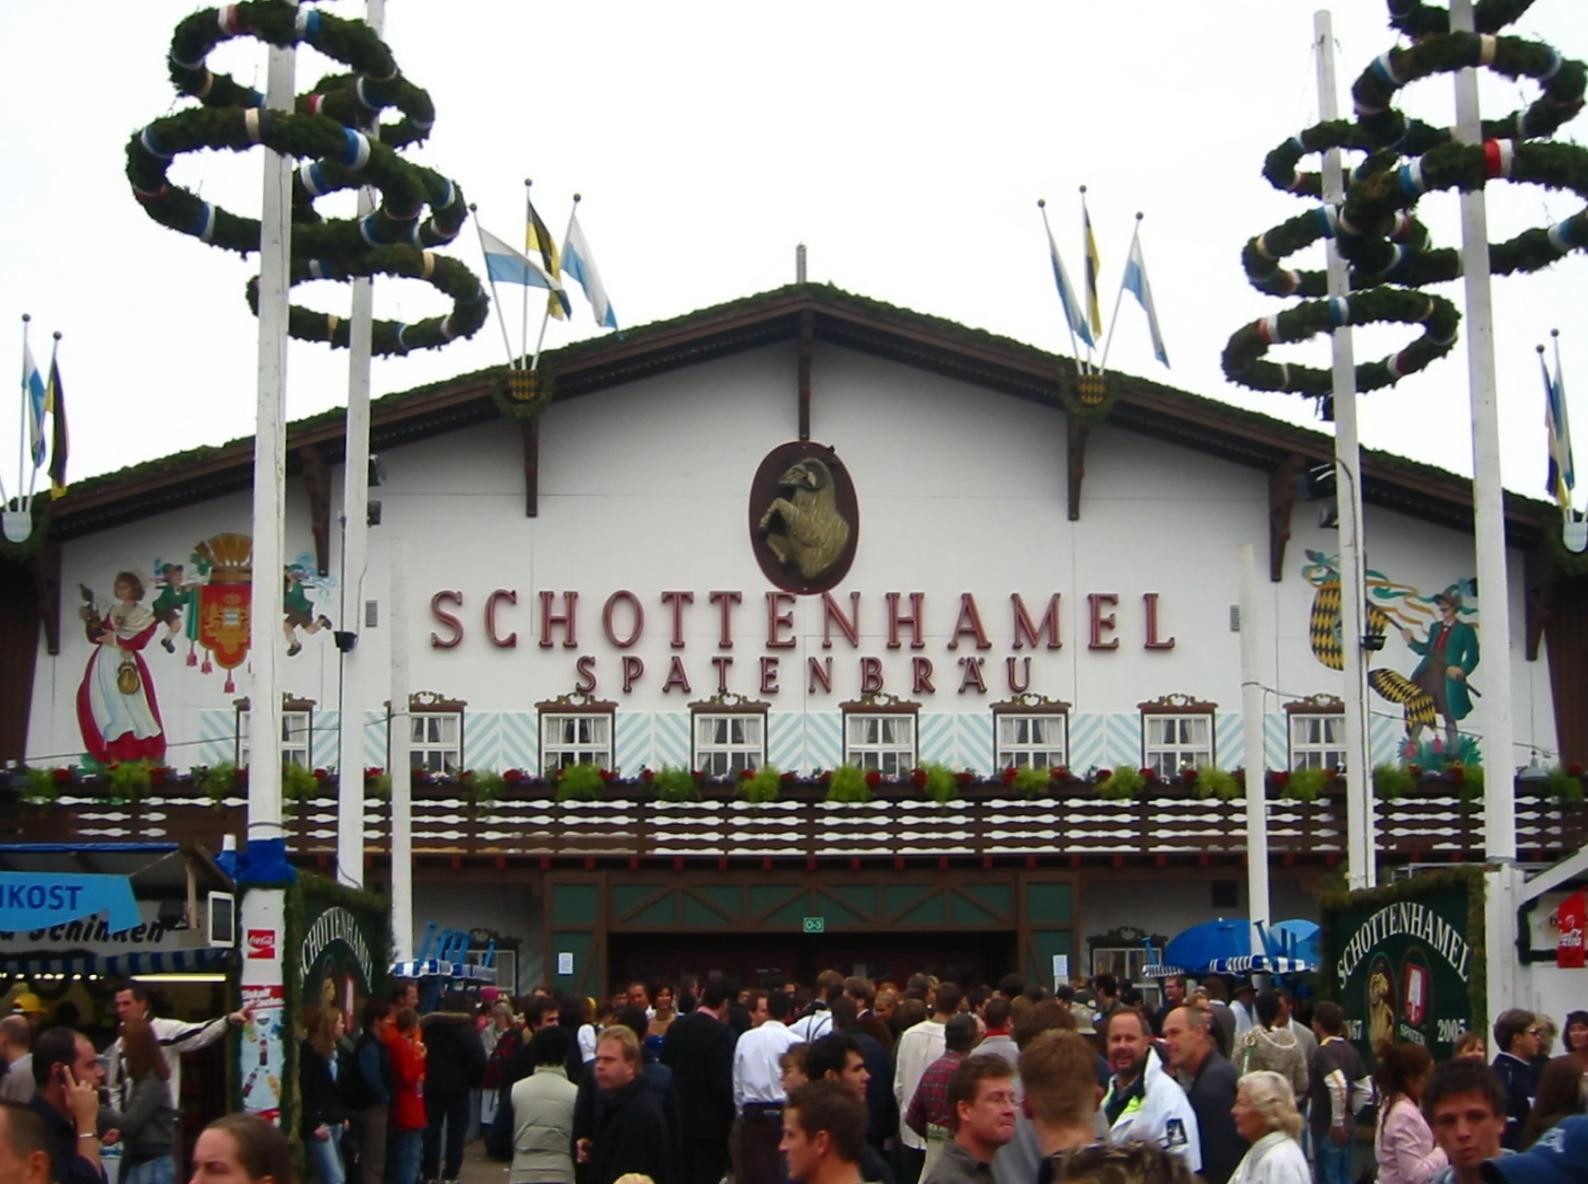 Октоберфест Schottenhamel